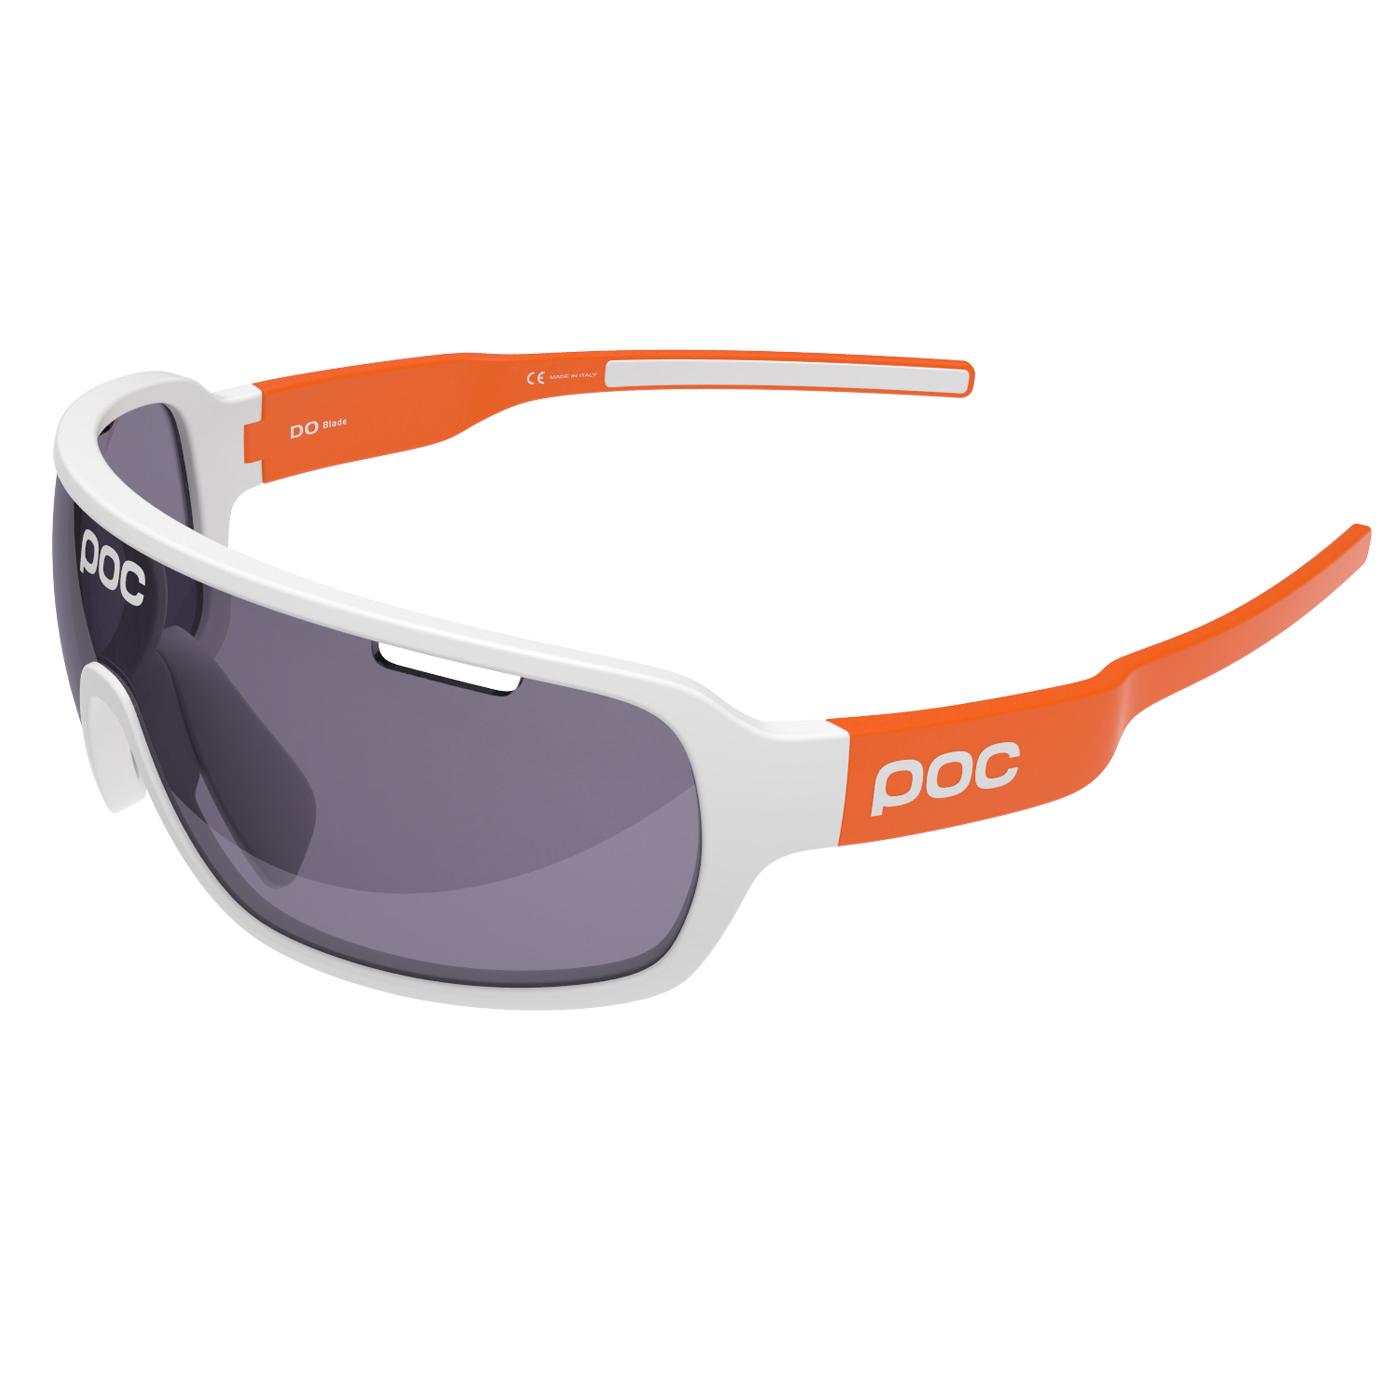 POC DO Blade AVIP Sunglasses サイクリング, アイウェア, 自転車